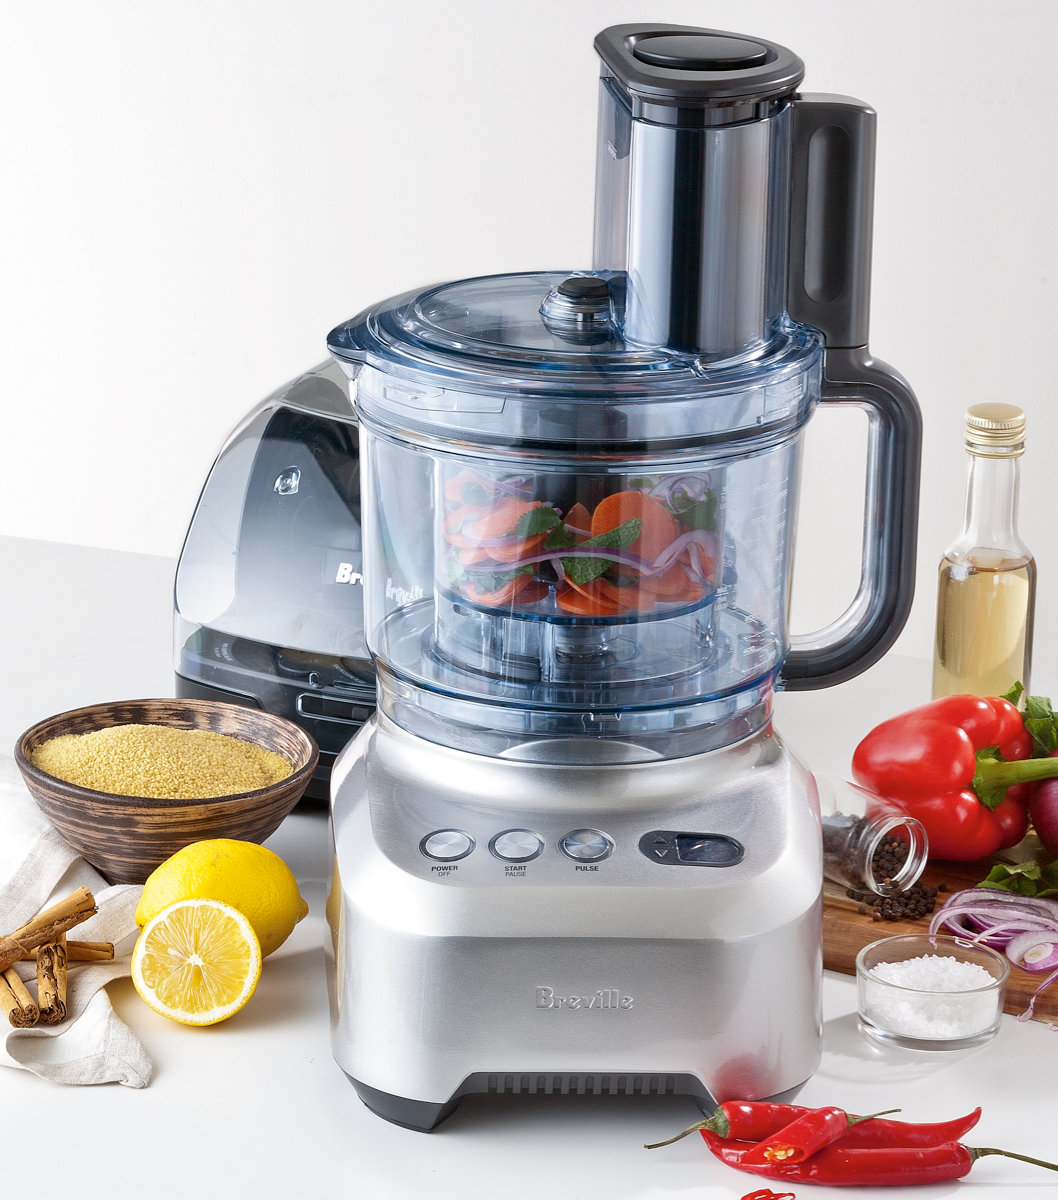 Breville Kitchen Wizz Pro Food Processor